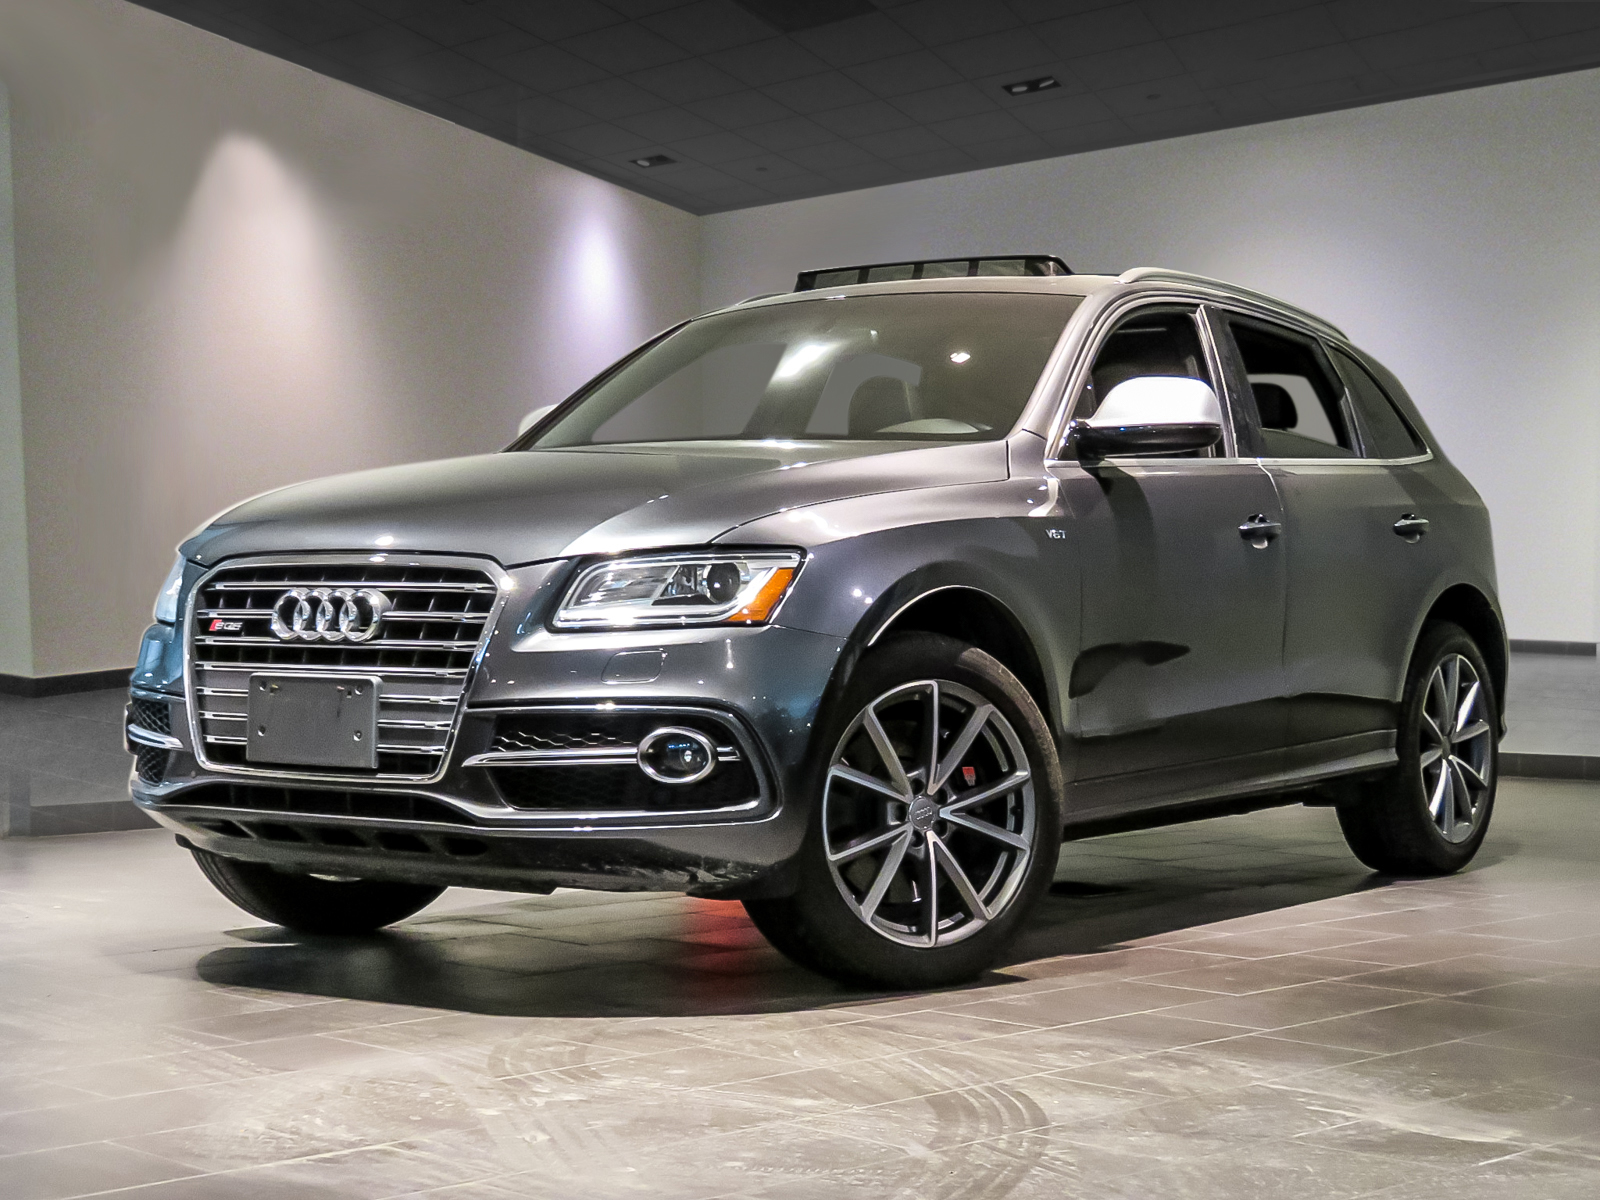 2016 Audi SQ5 - Boost Listings